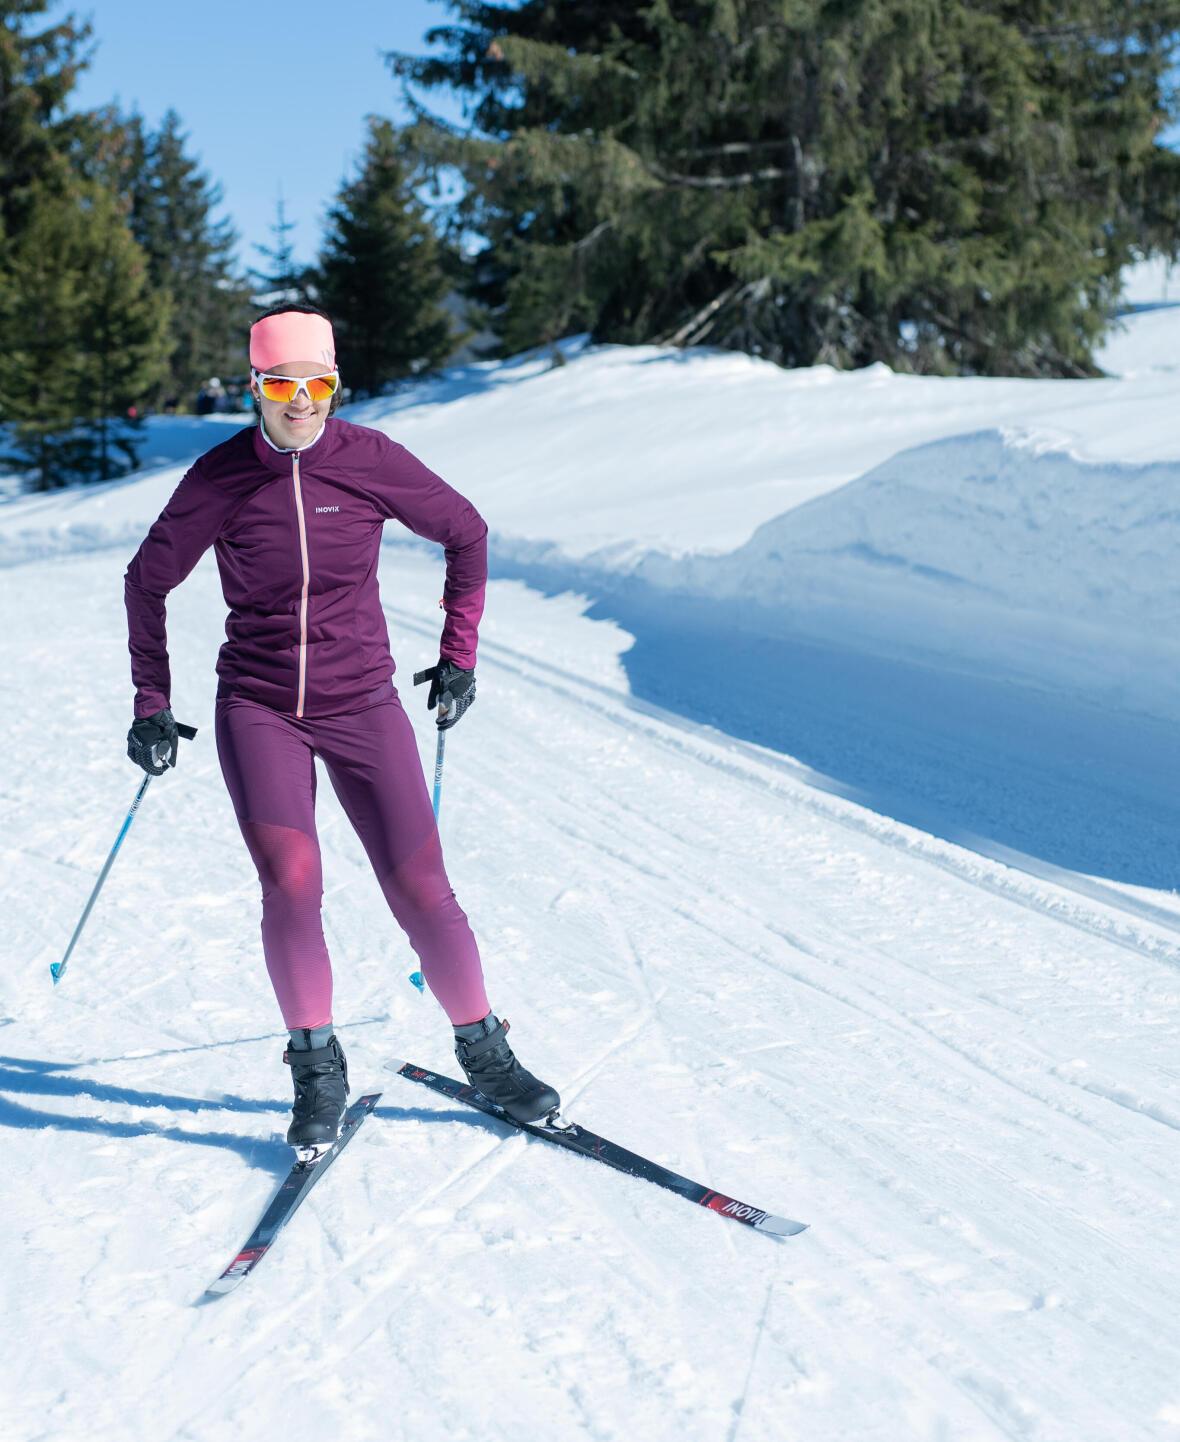 femme en plein course de ski de fond